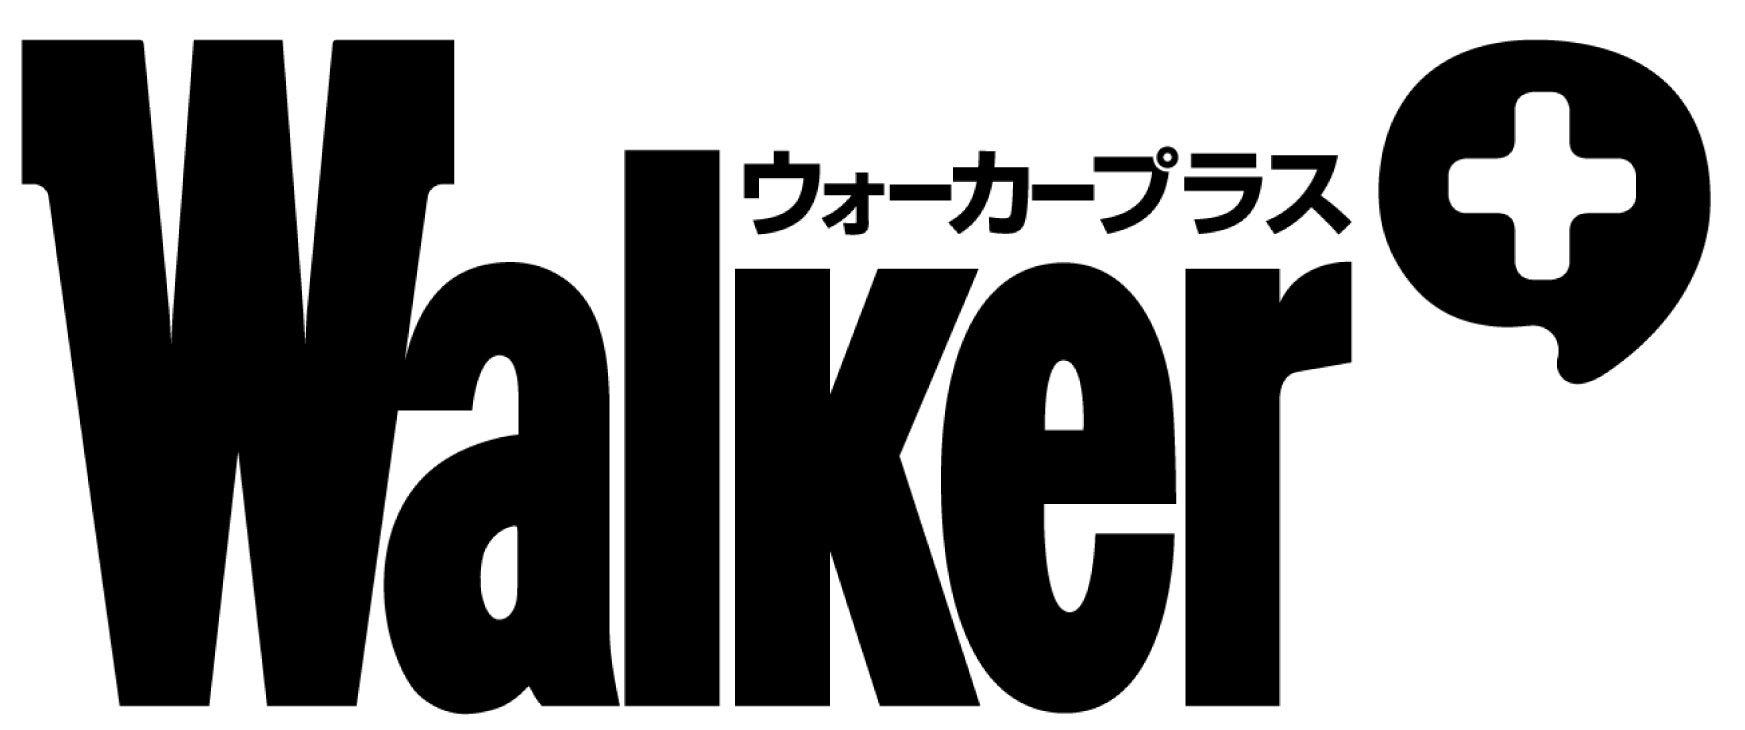 Walkerplus[地域トピックス]